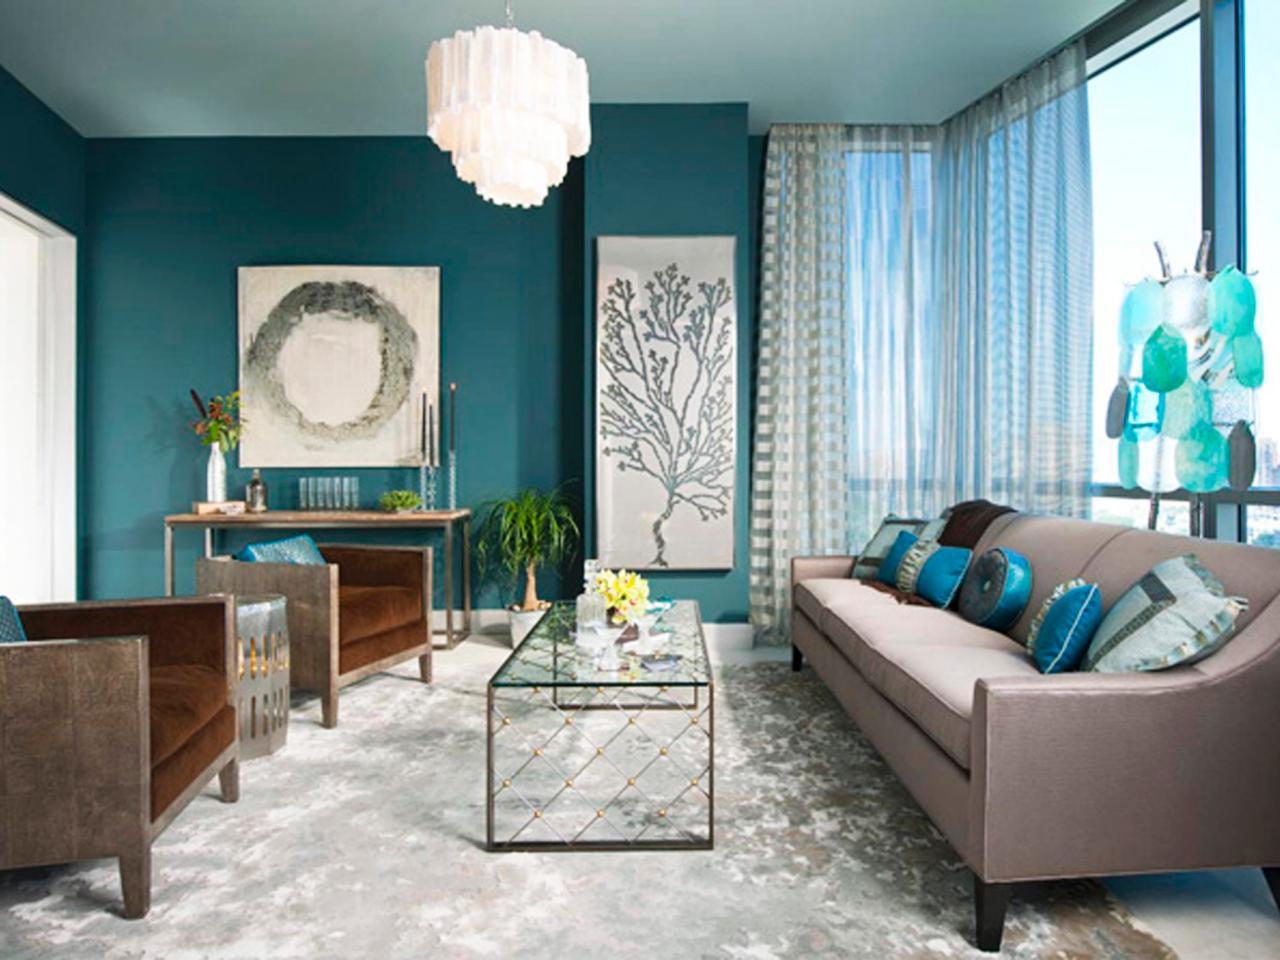 Ruang Tamu Dalam Warna Biru 49 Foto Reka Bentuk Dalaman Dalam Warna Turquoise Aksen Dan Kombinasi Dengan Warna Kuning Air Dan Coklat